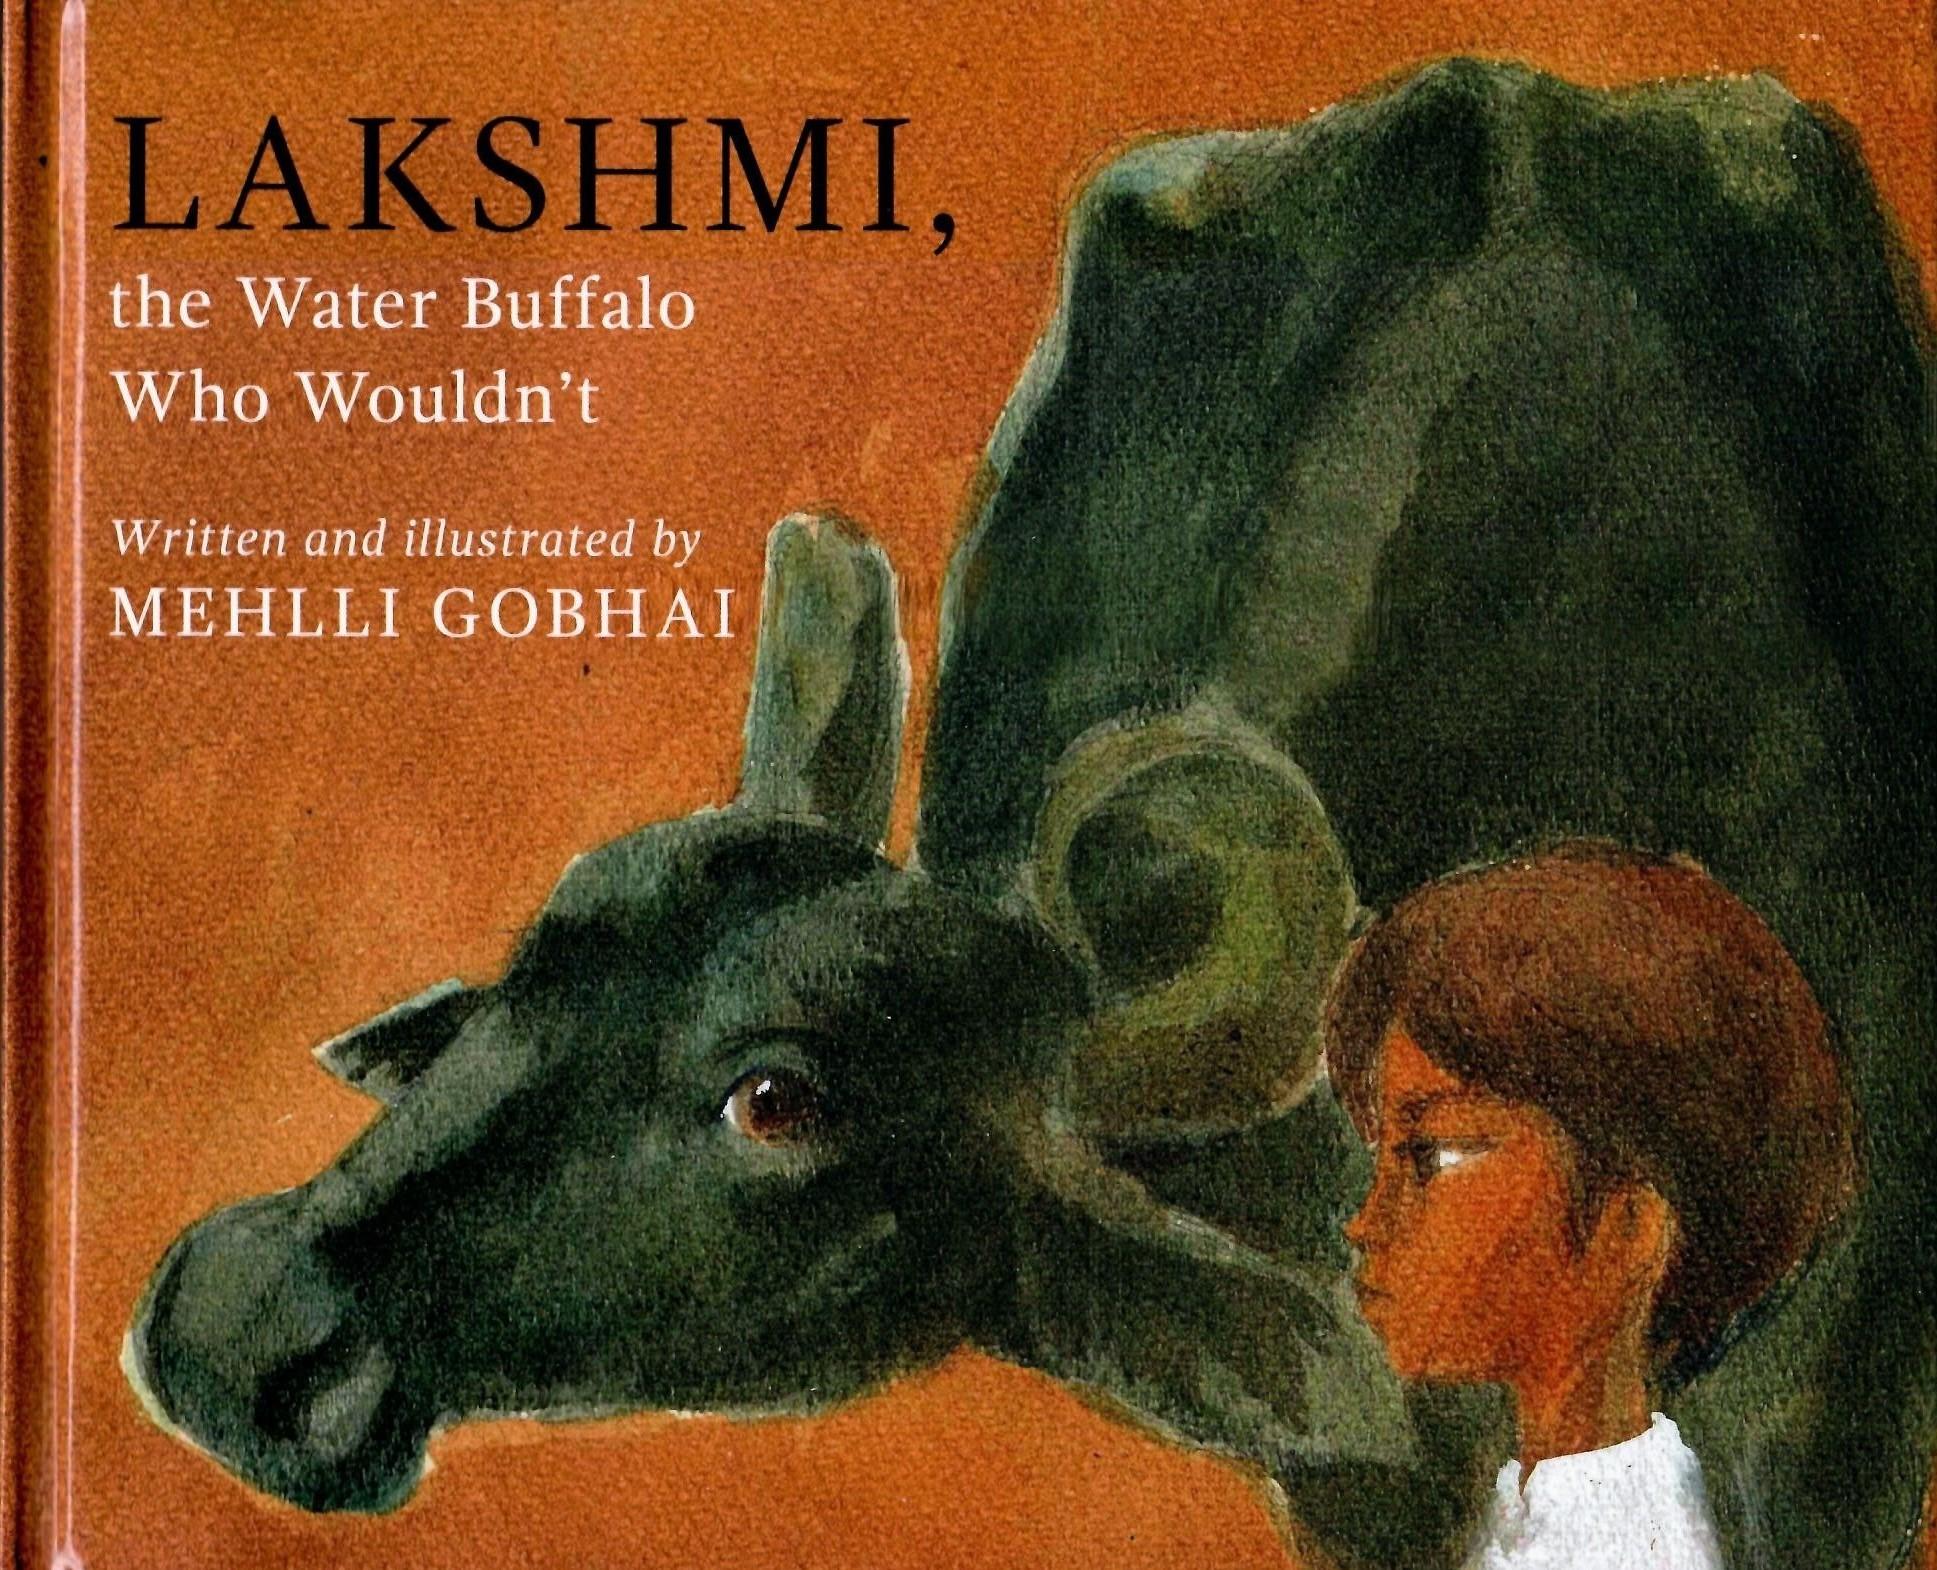 Lakshmi, the water buffalo who wouldn't